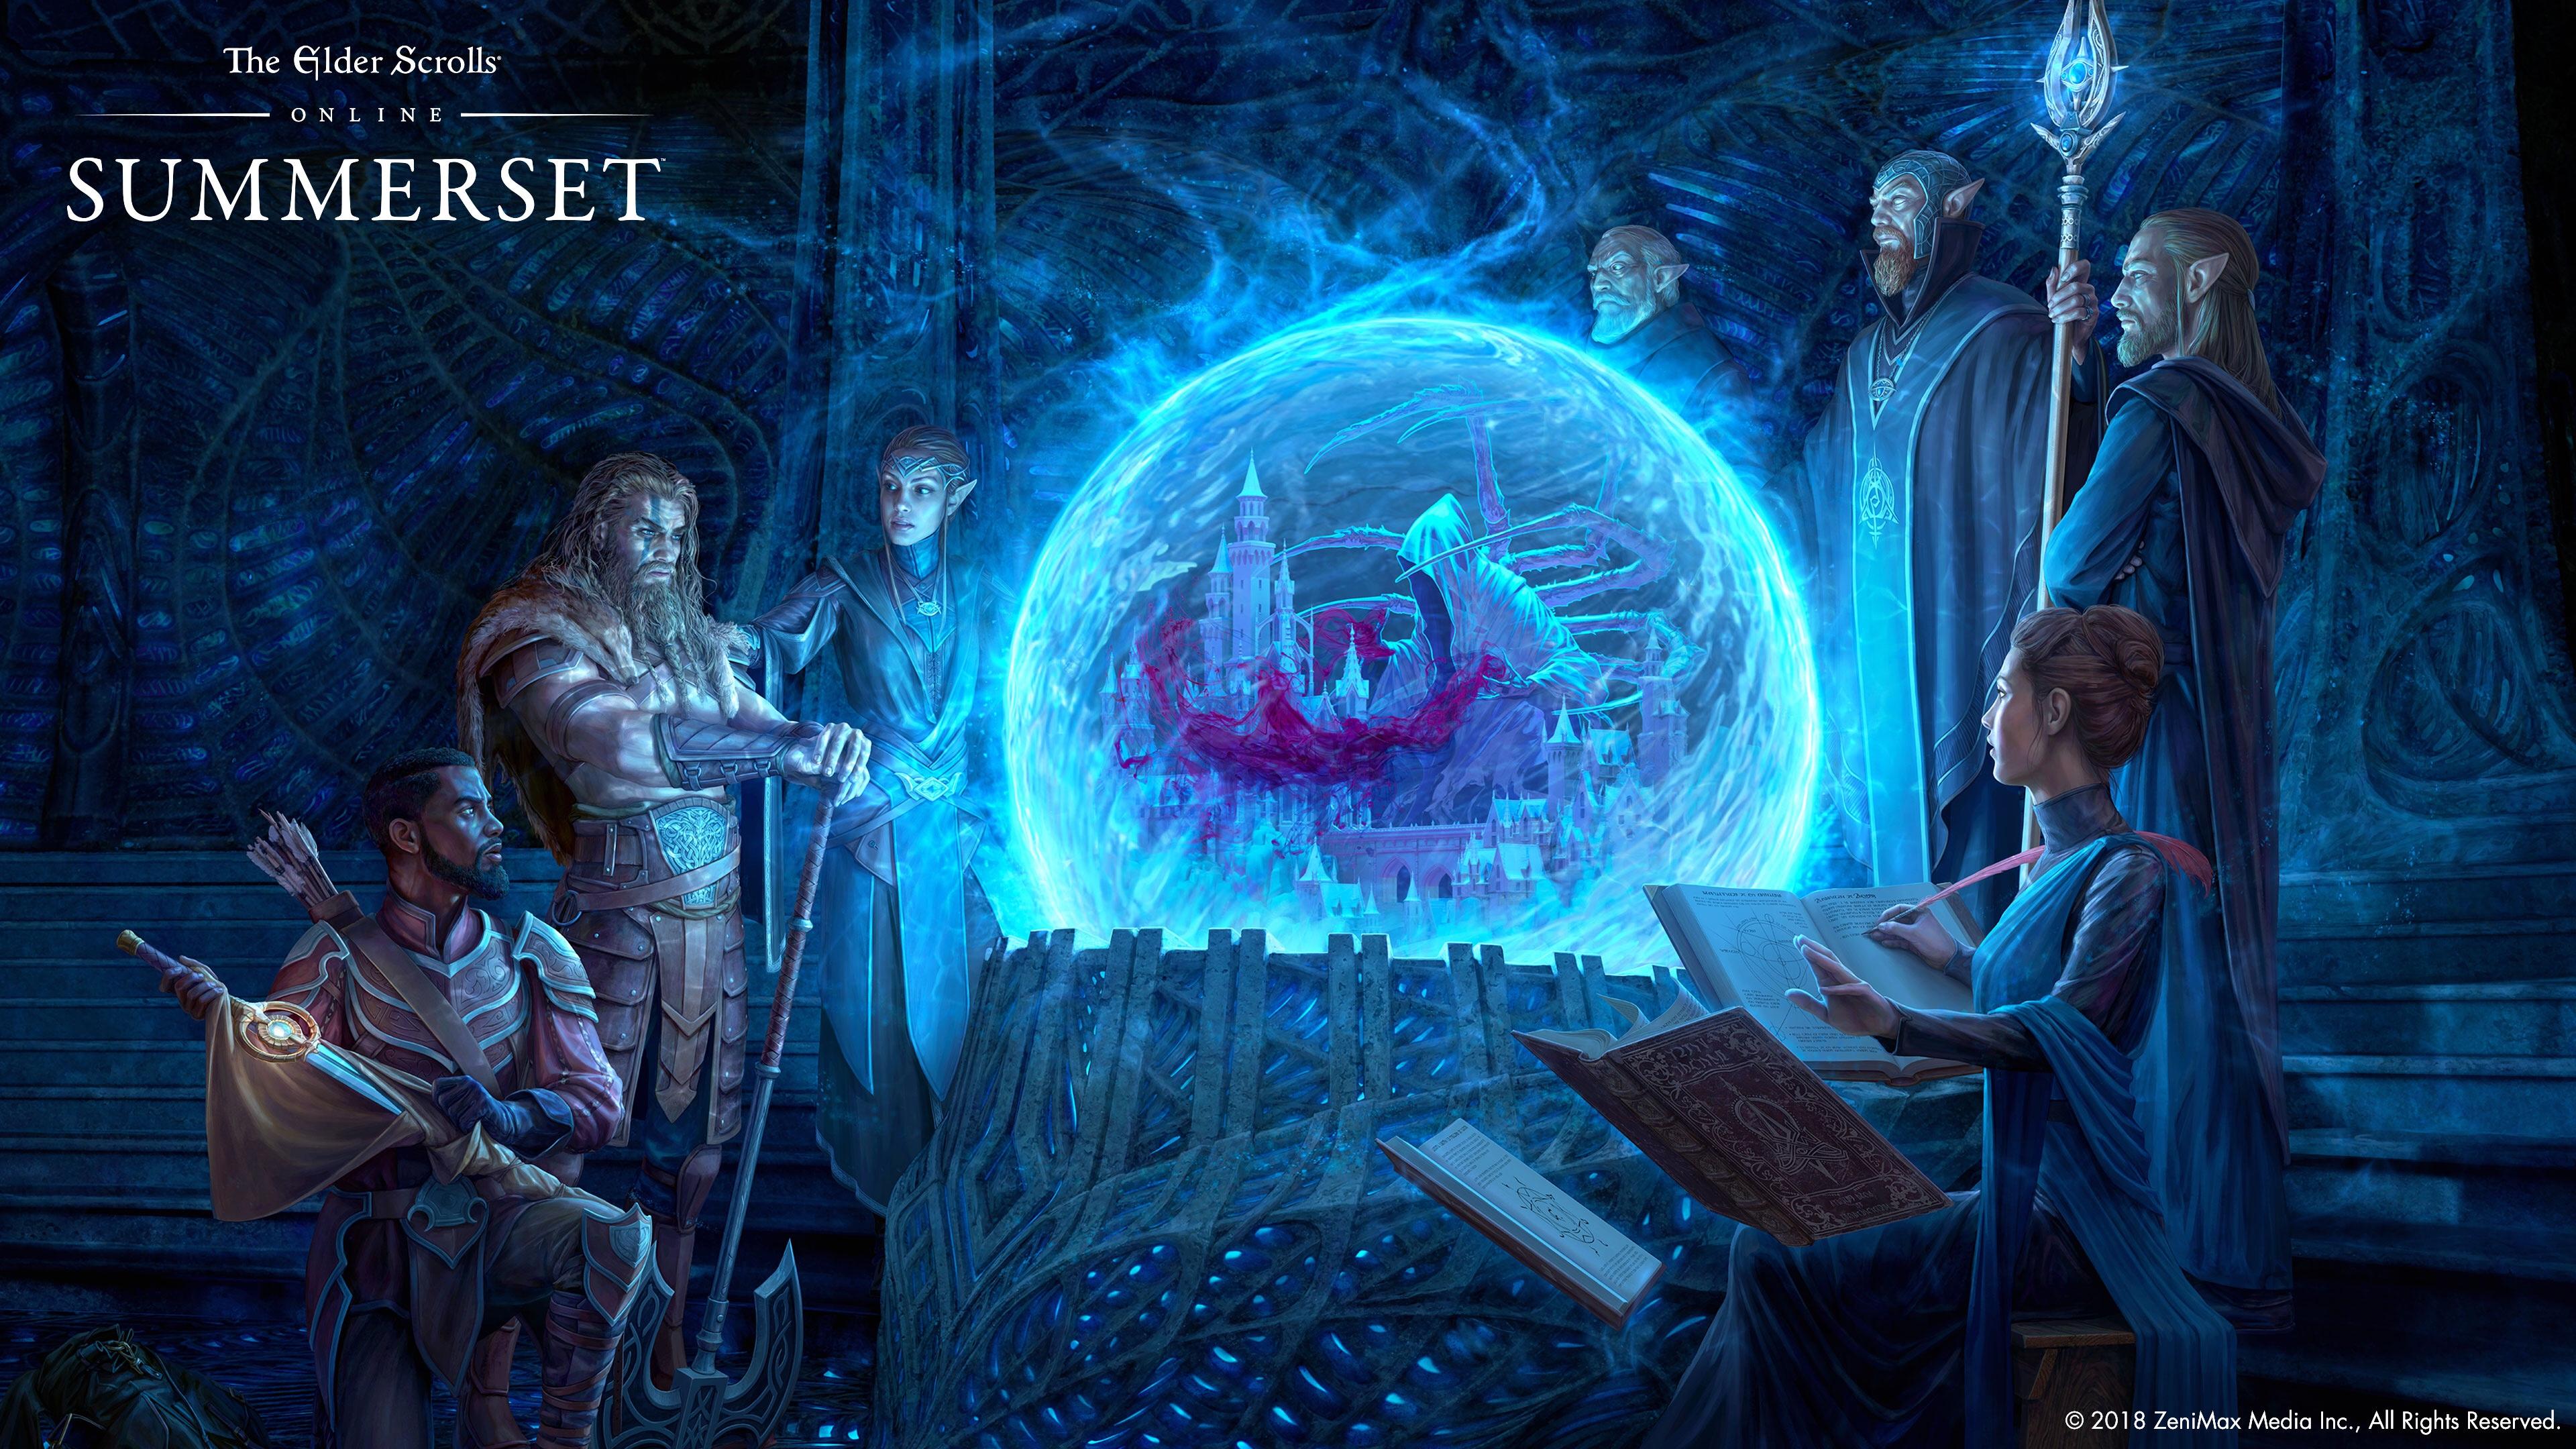 The Elder Scrolls Wallpaper Collection. U201c